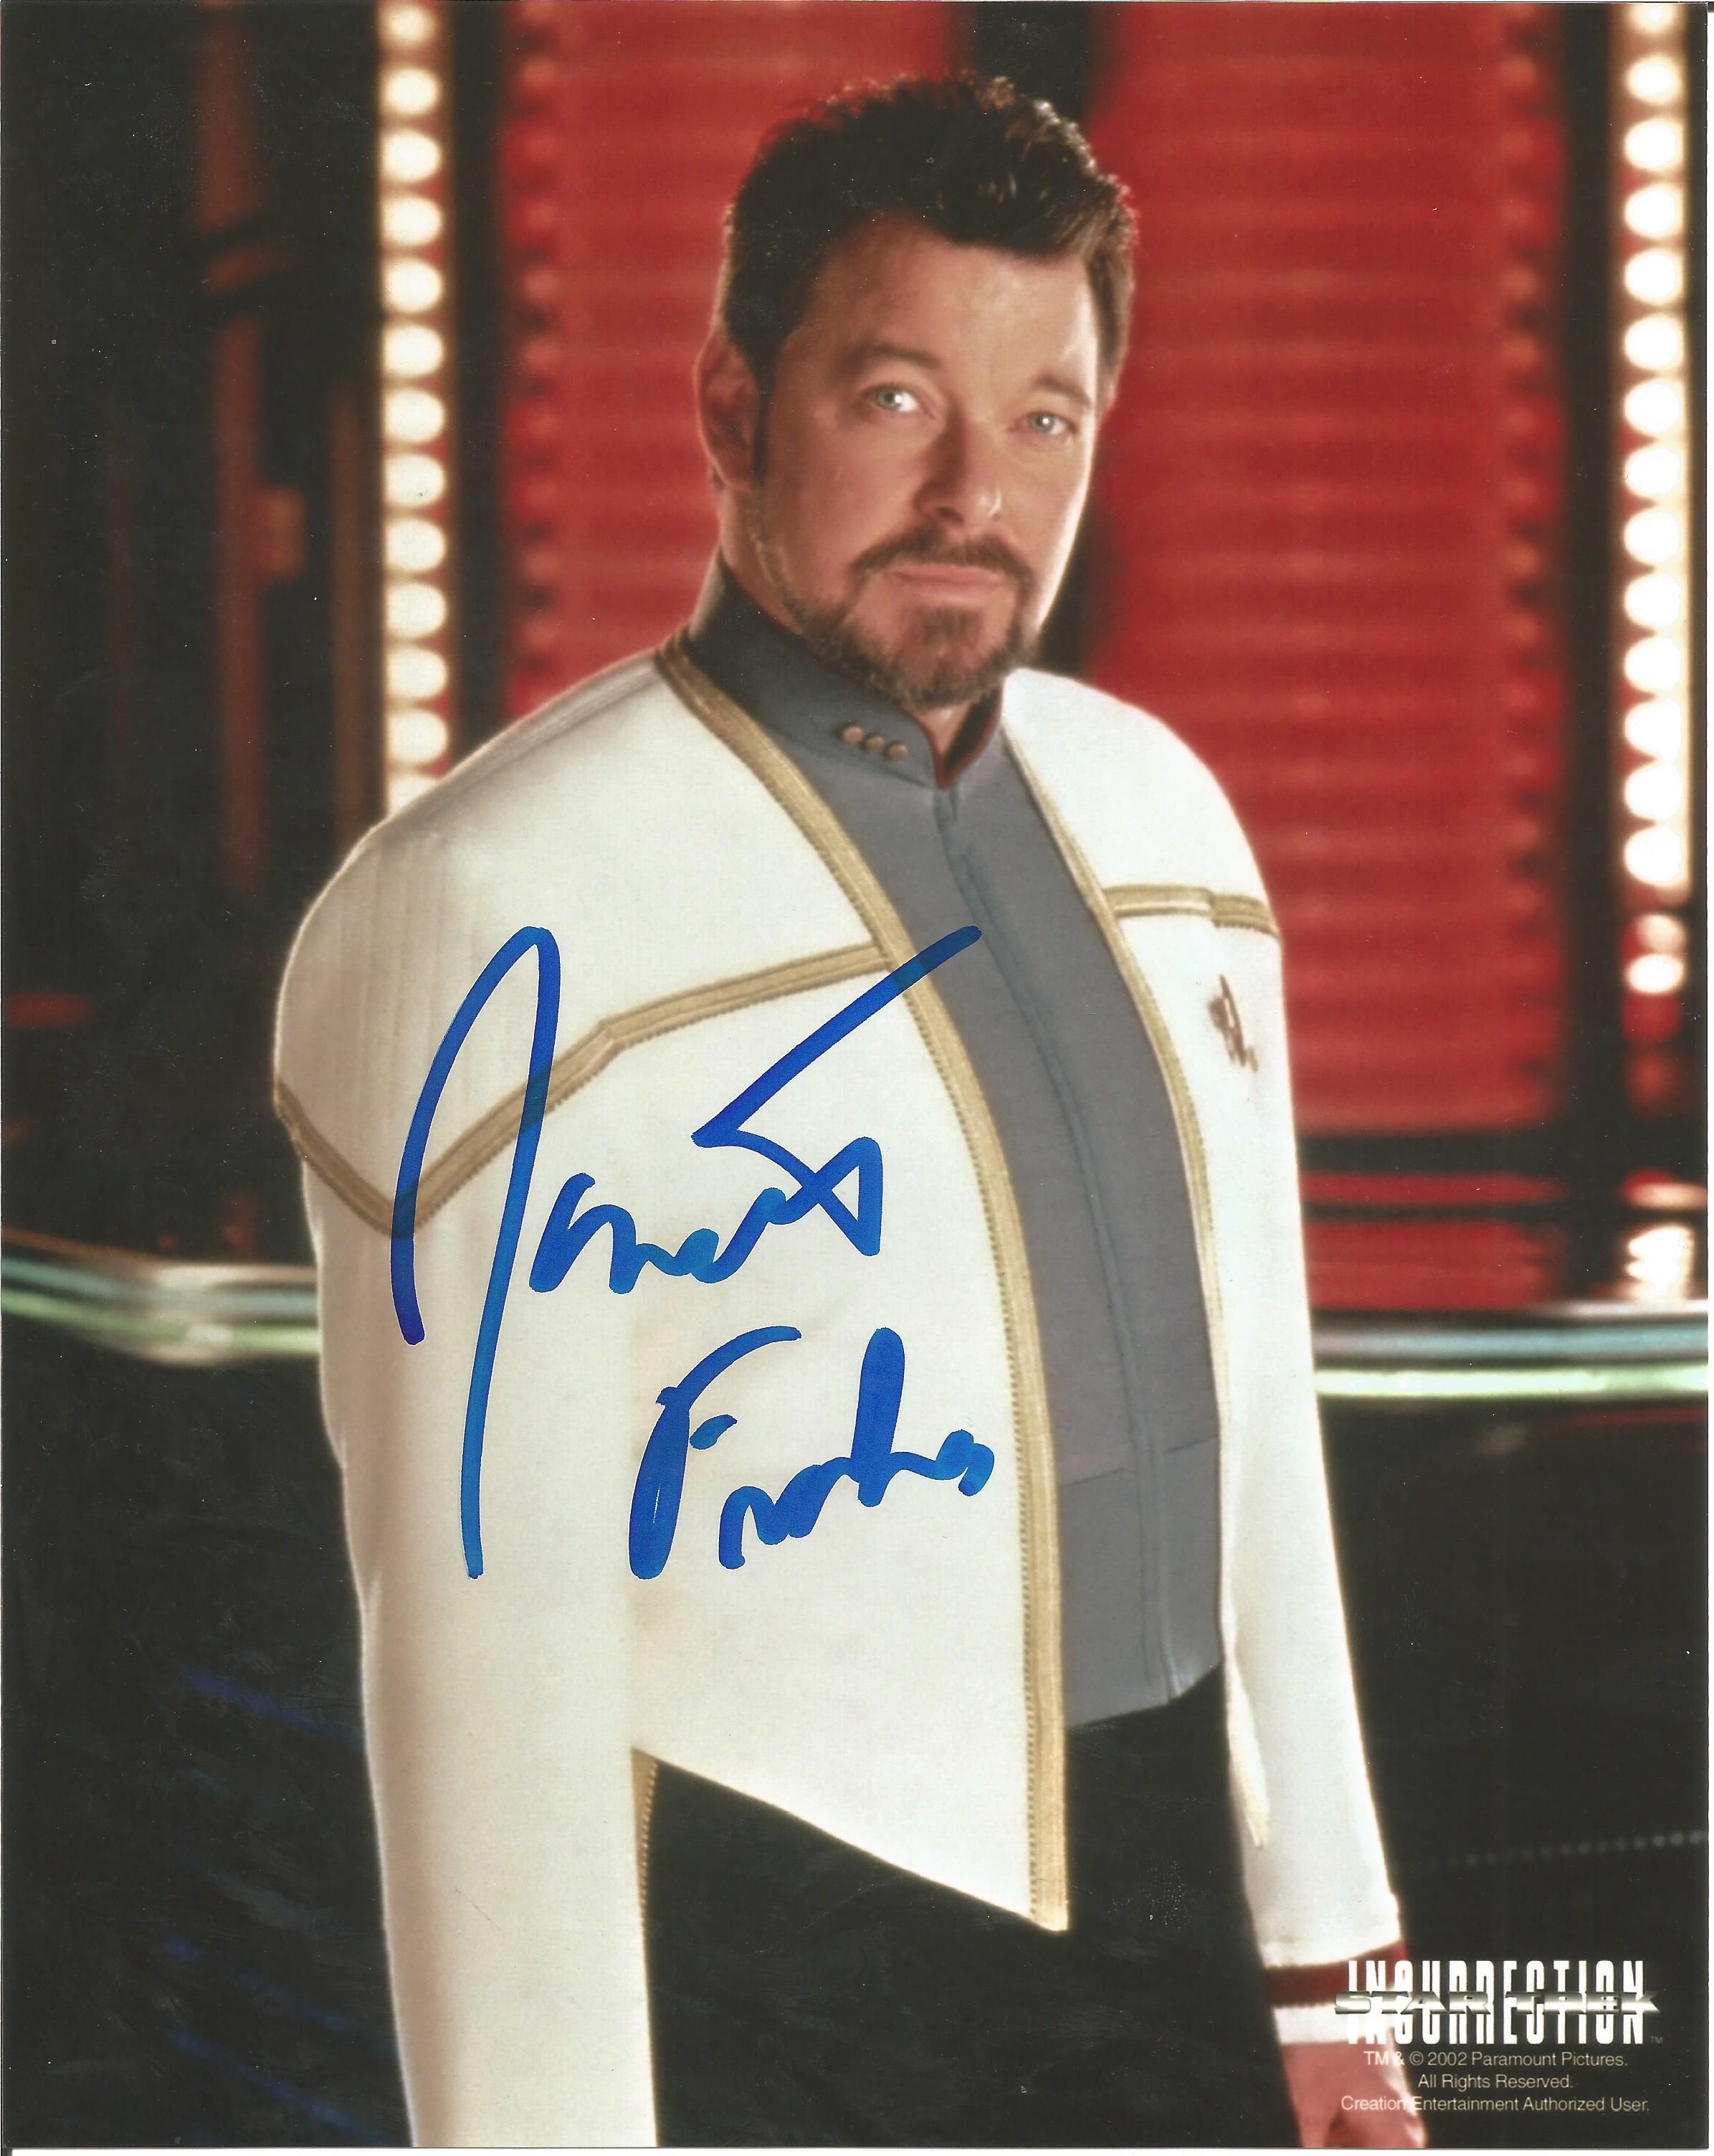 Jonathan Frakes Star Trek hand signed 10x8 photo  This beautiful